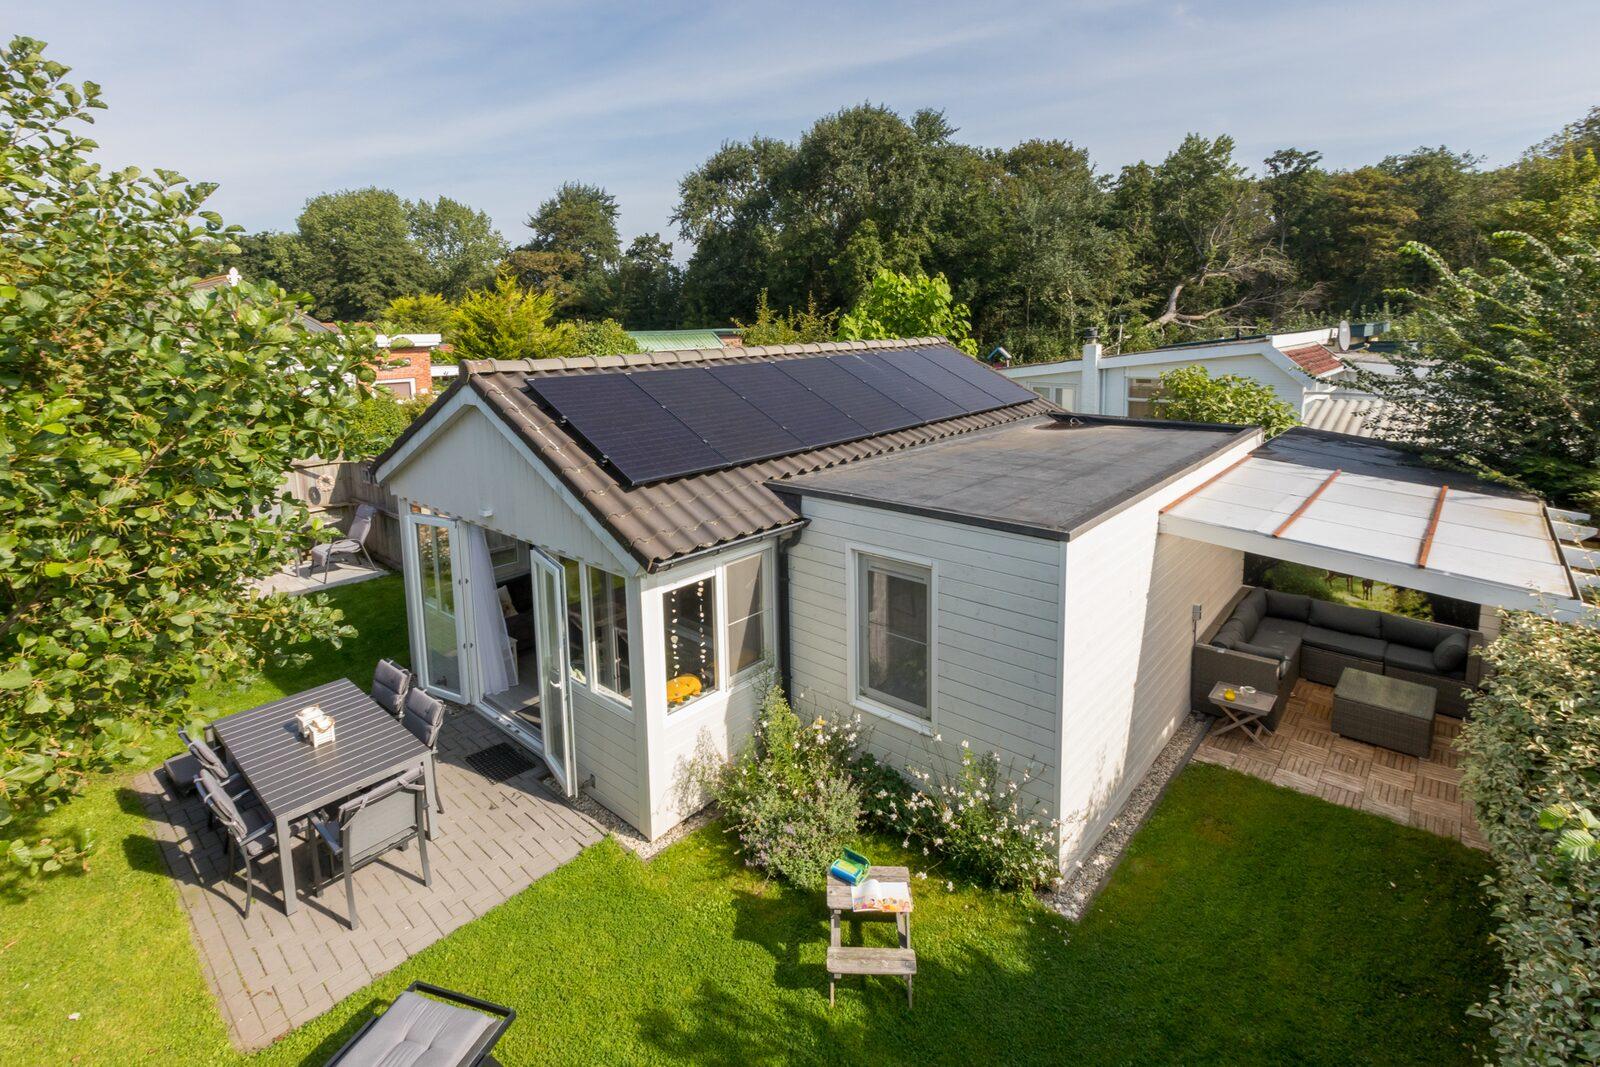 Ferienhaus - Burgvliet 78 | Oostkapelle